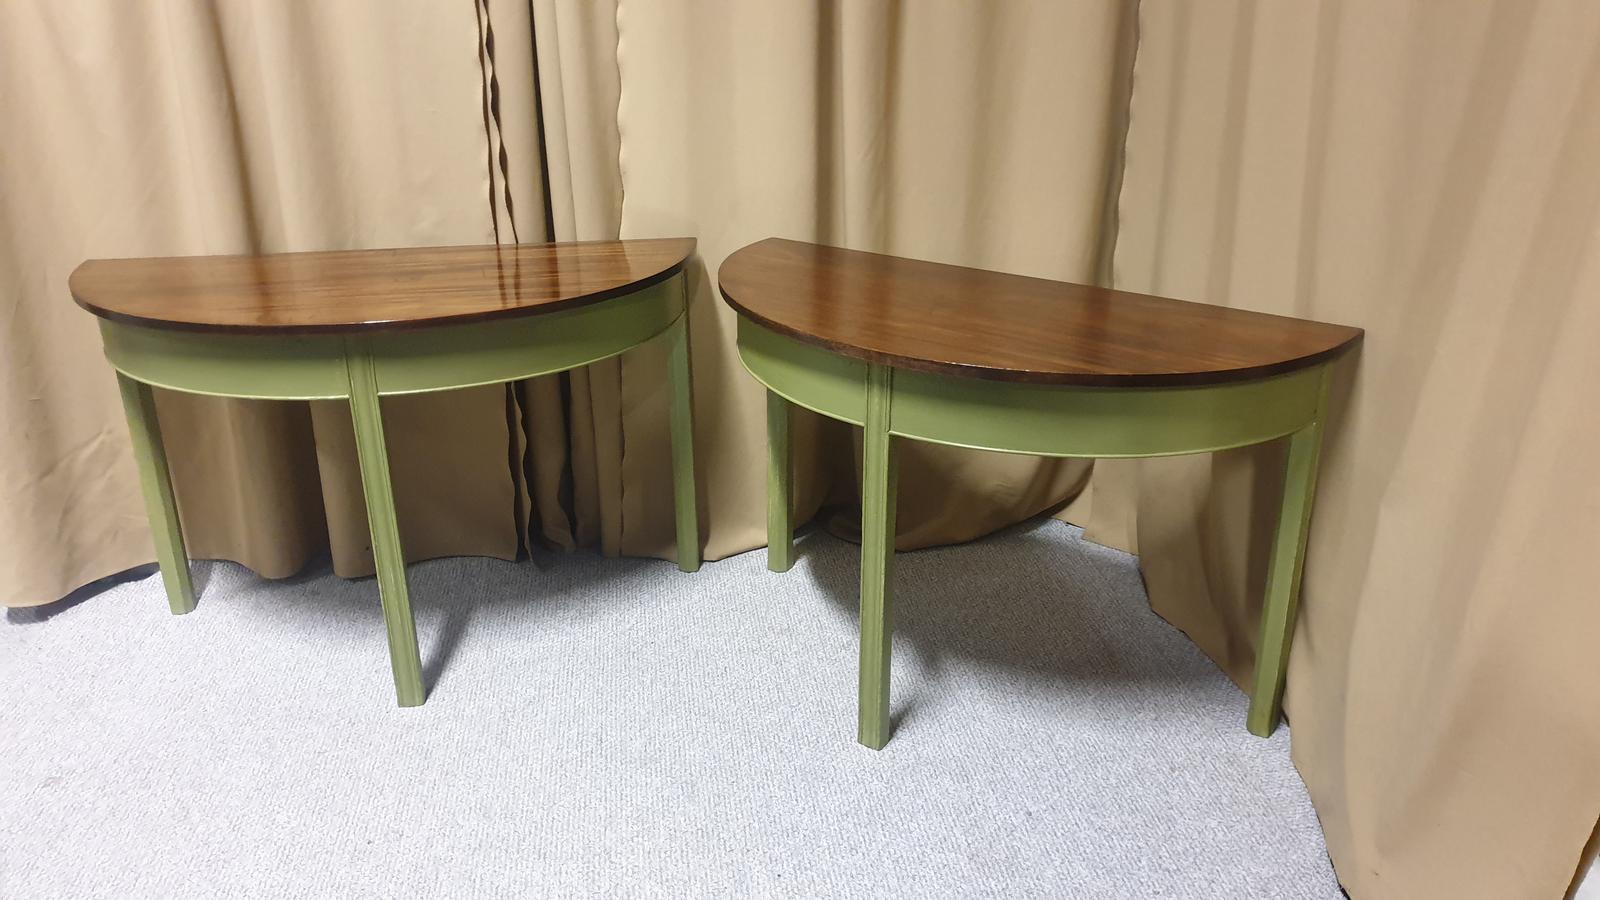 Pair of Regency Mahogany Console Tables (1 of 1)